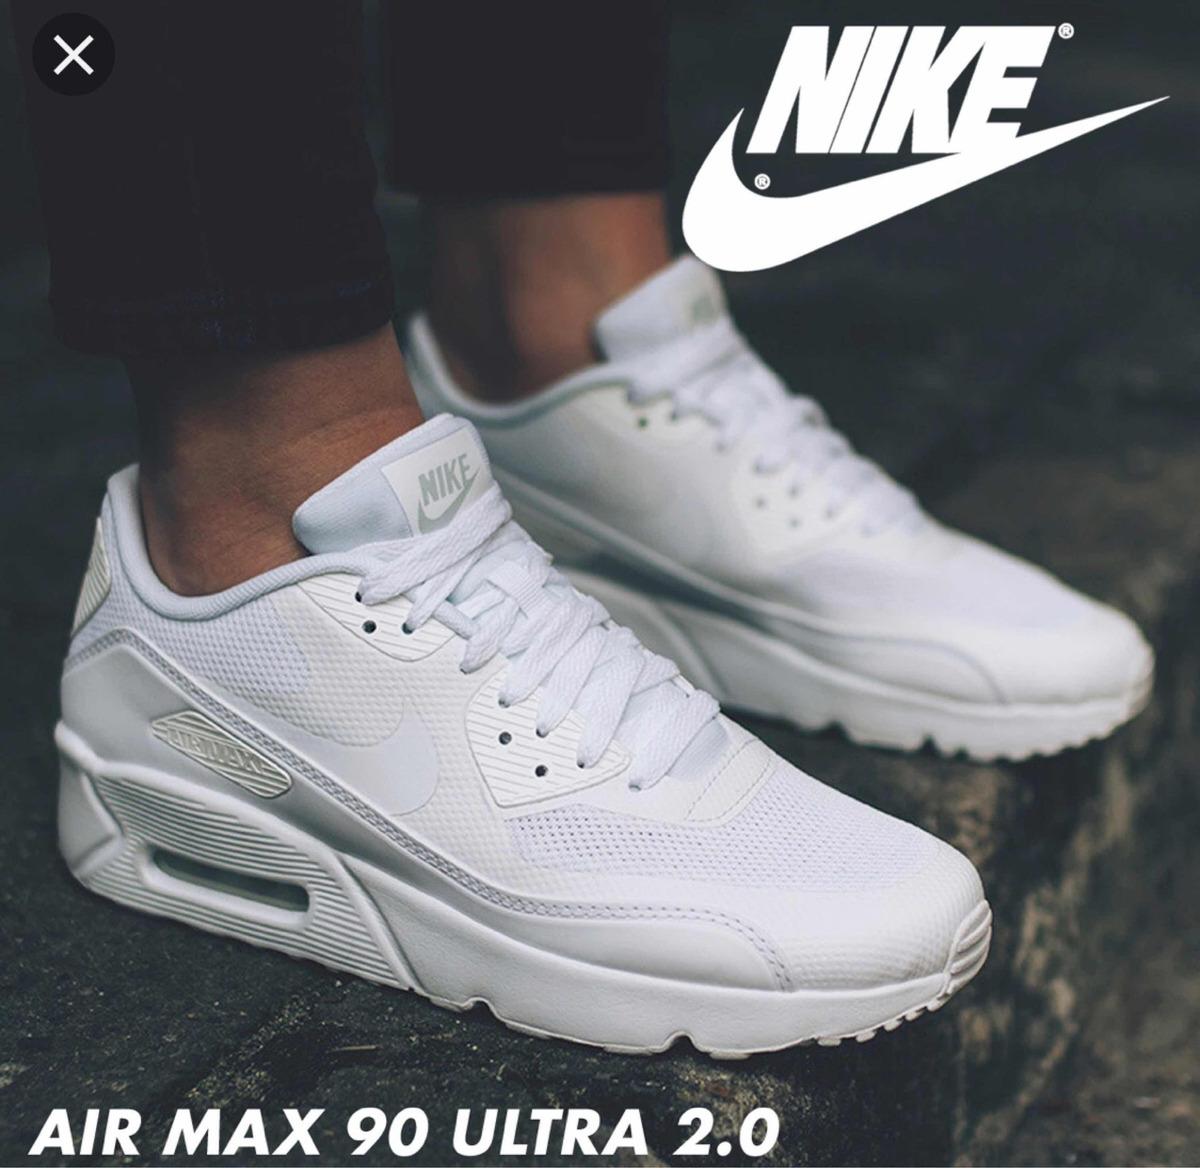 Tenis Nike Airmax 90 Ultra 2.0 Essential Entrega Inmediata